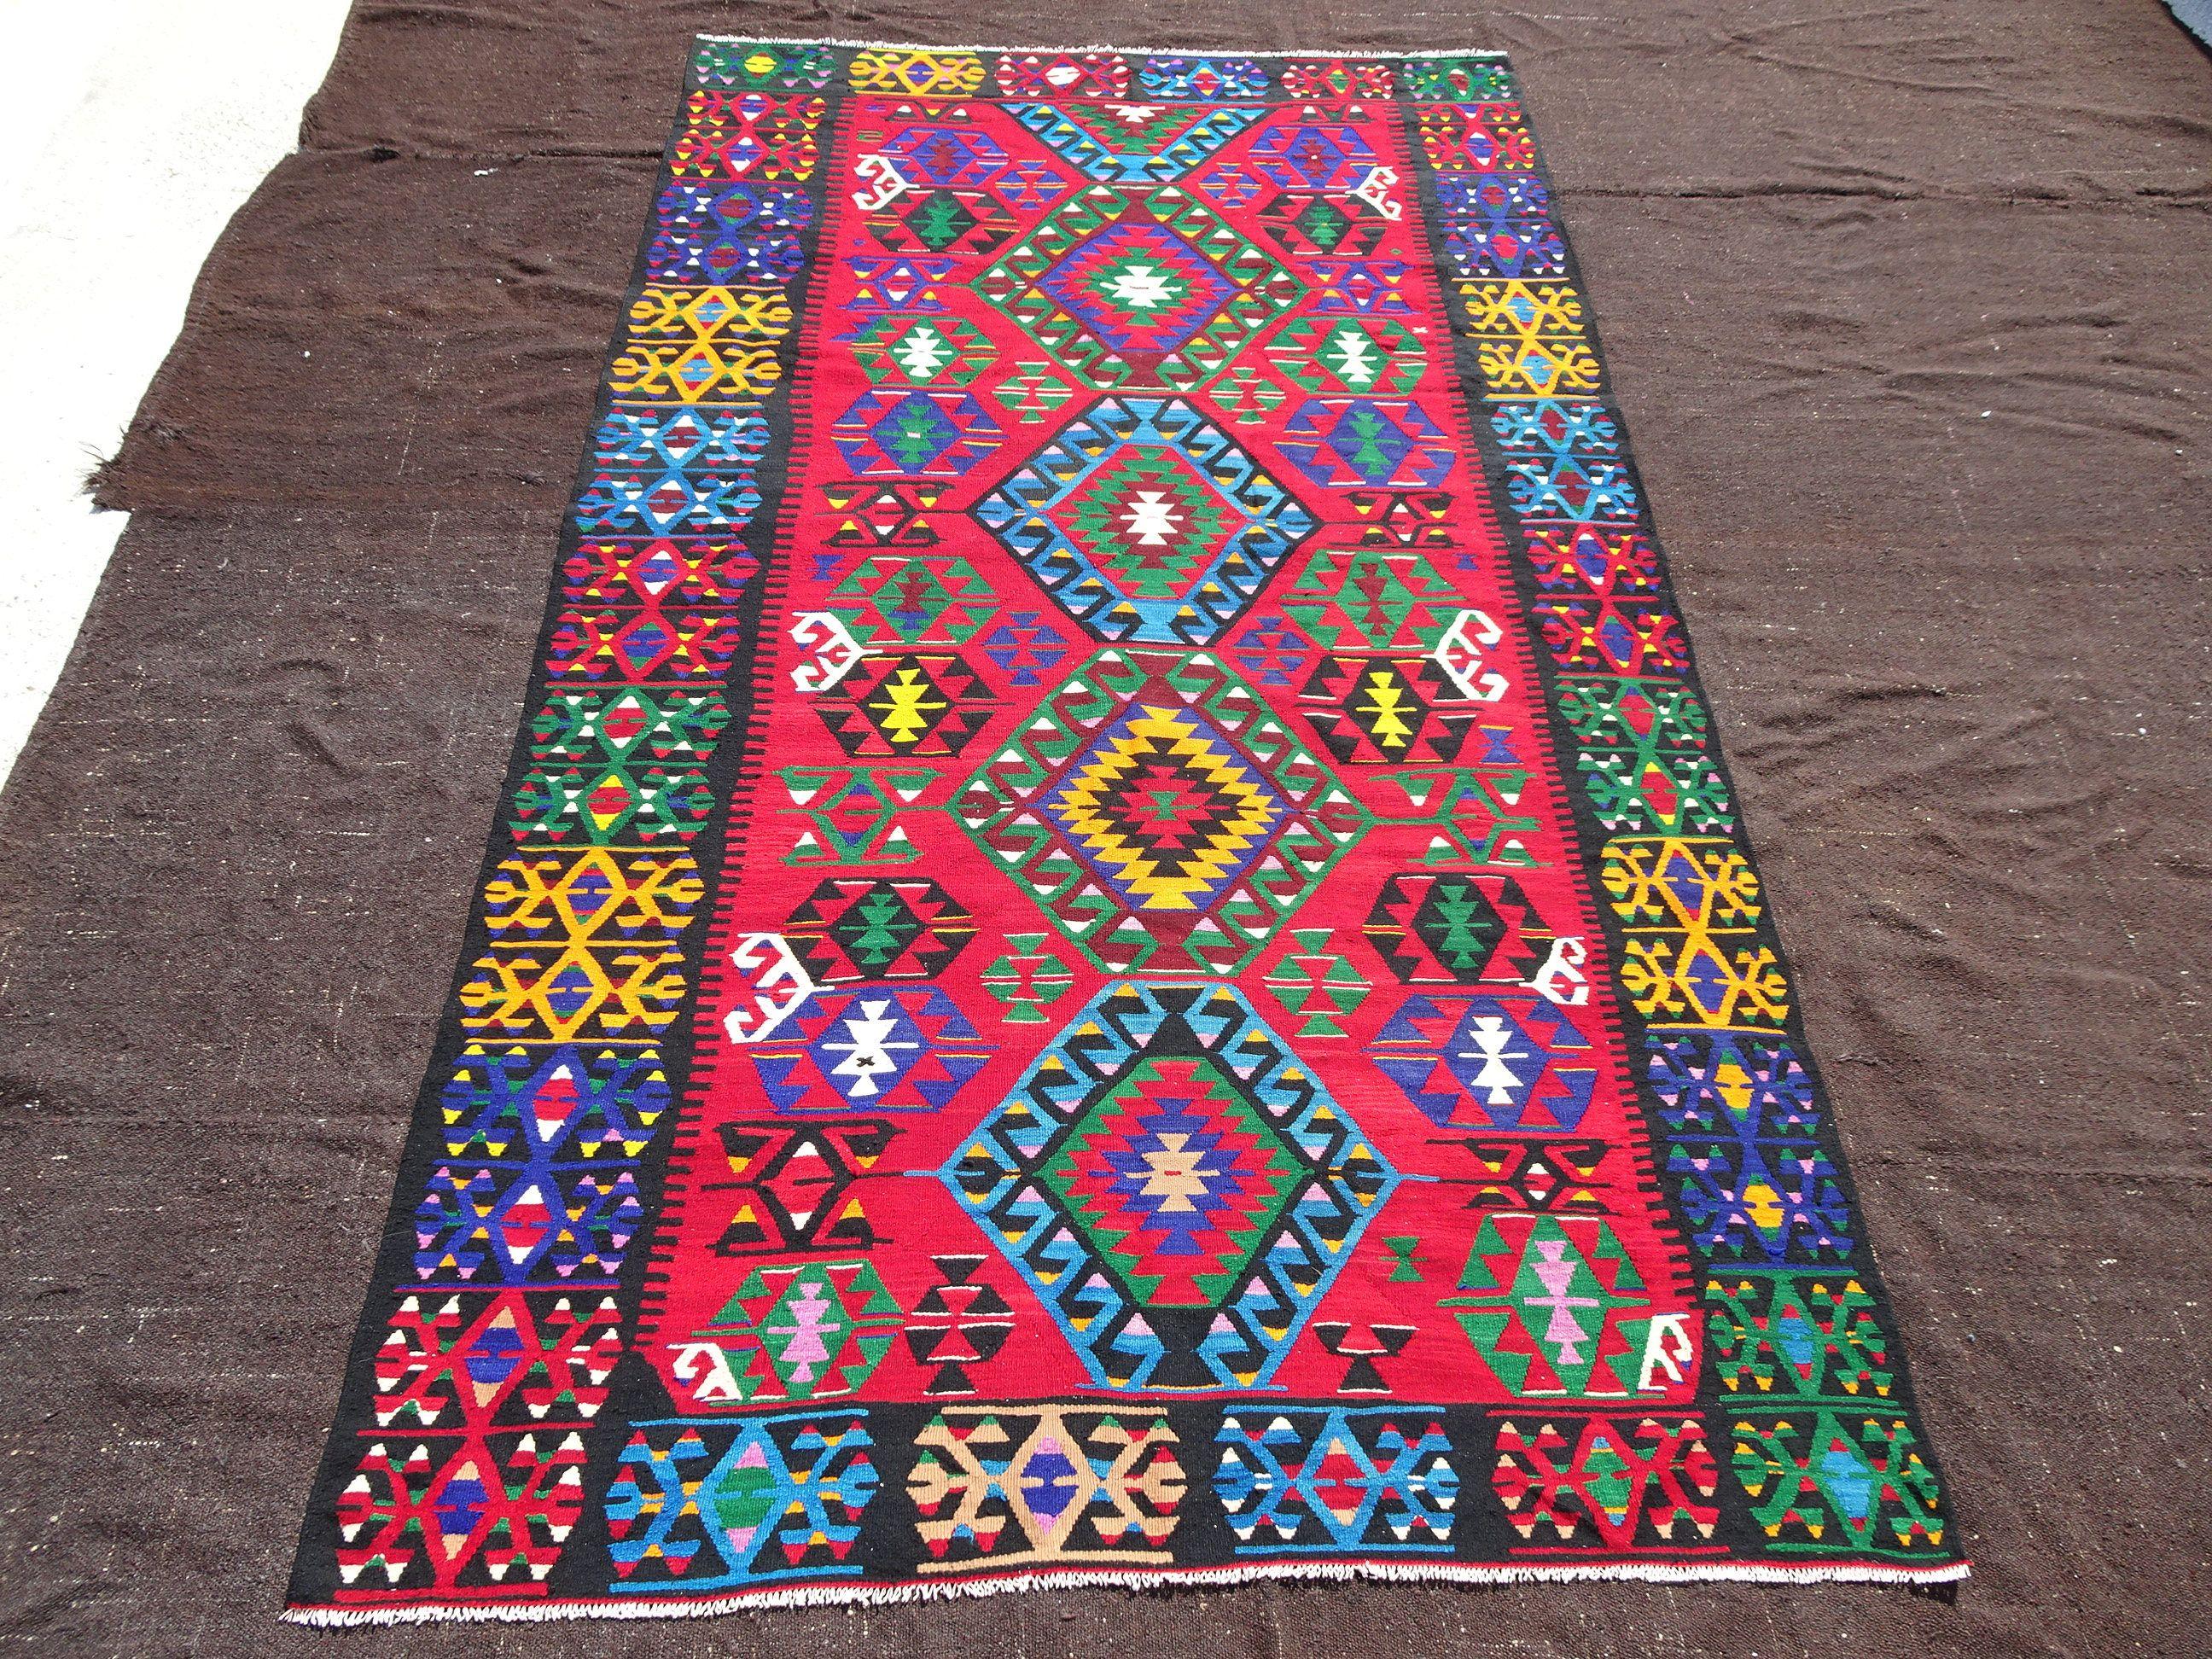 Colorful Turkish Rug 6 7 X10 11 Feet 200x332 Cm Vintage